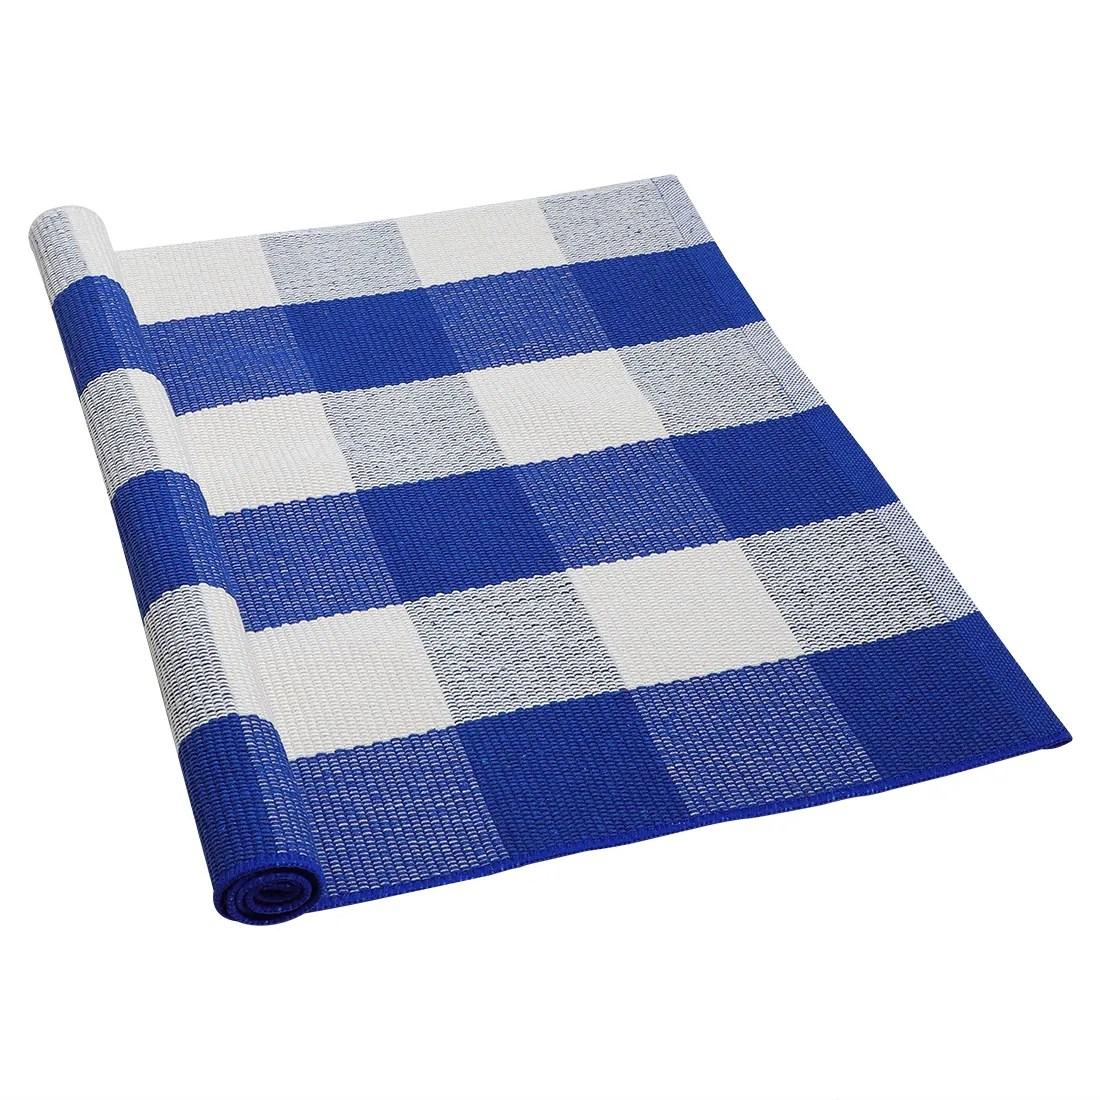 Cotton Checkered Plaid Floor Area Rug Runner Carpet Mat Indoor Outdoor Washable